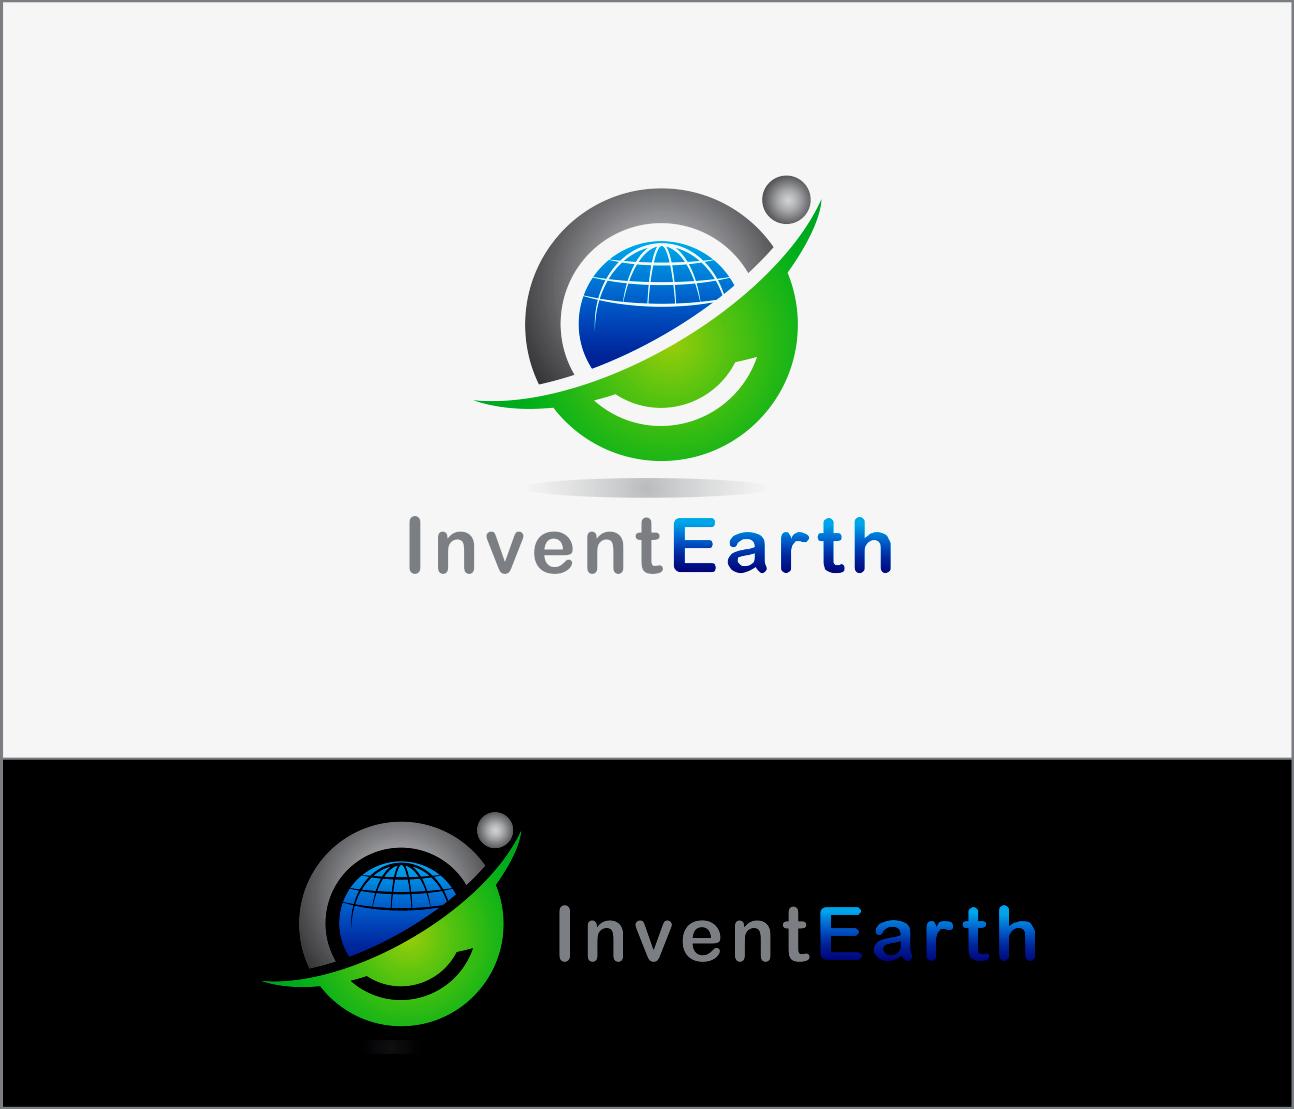 Logo Design by Armada Jamaluddin - Entry No. 115 in the Logo Design Contest Artistic Logo Design for Invent Earth.